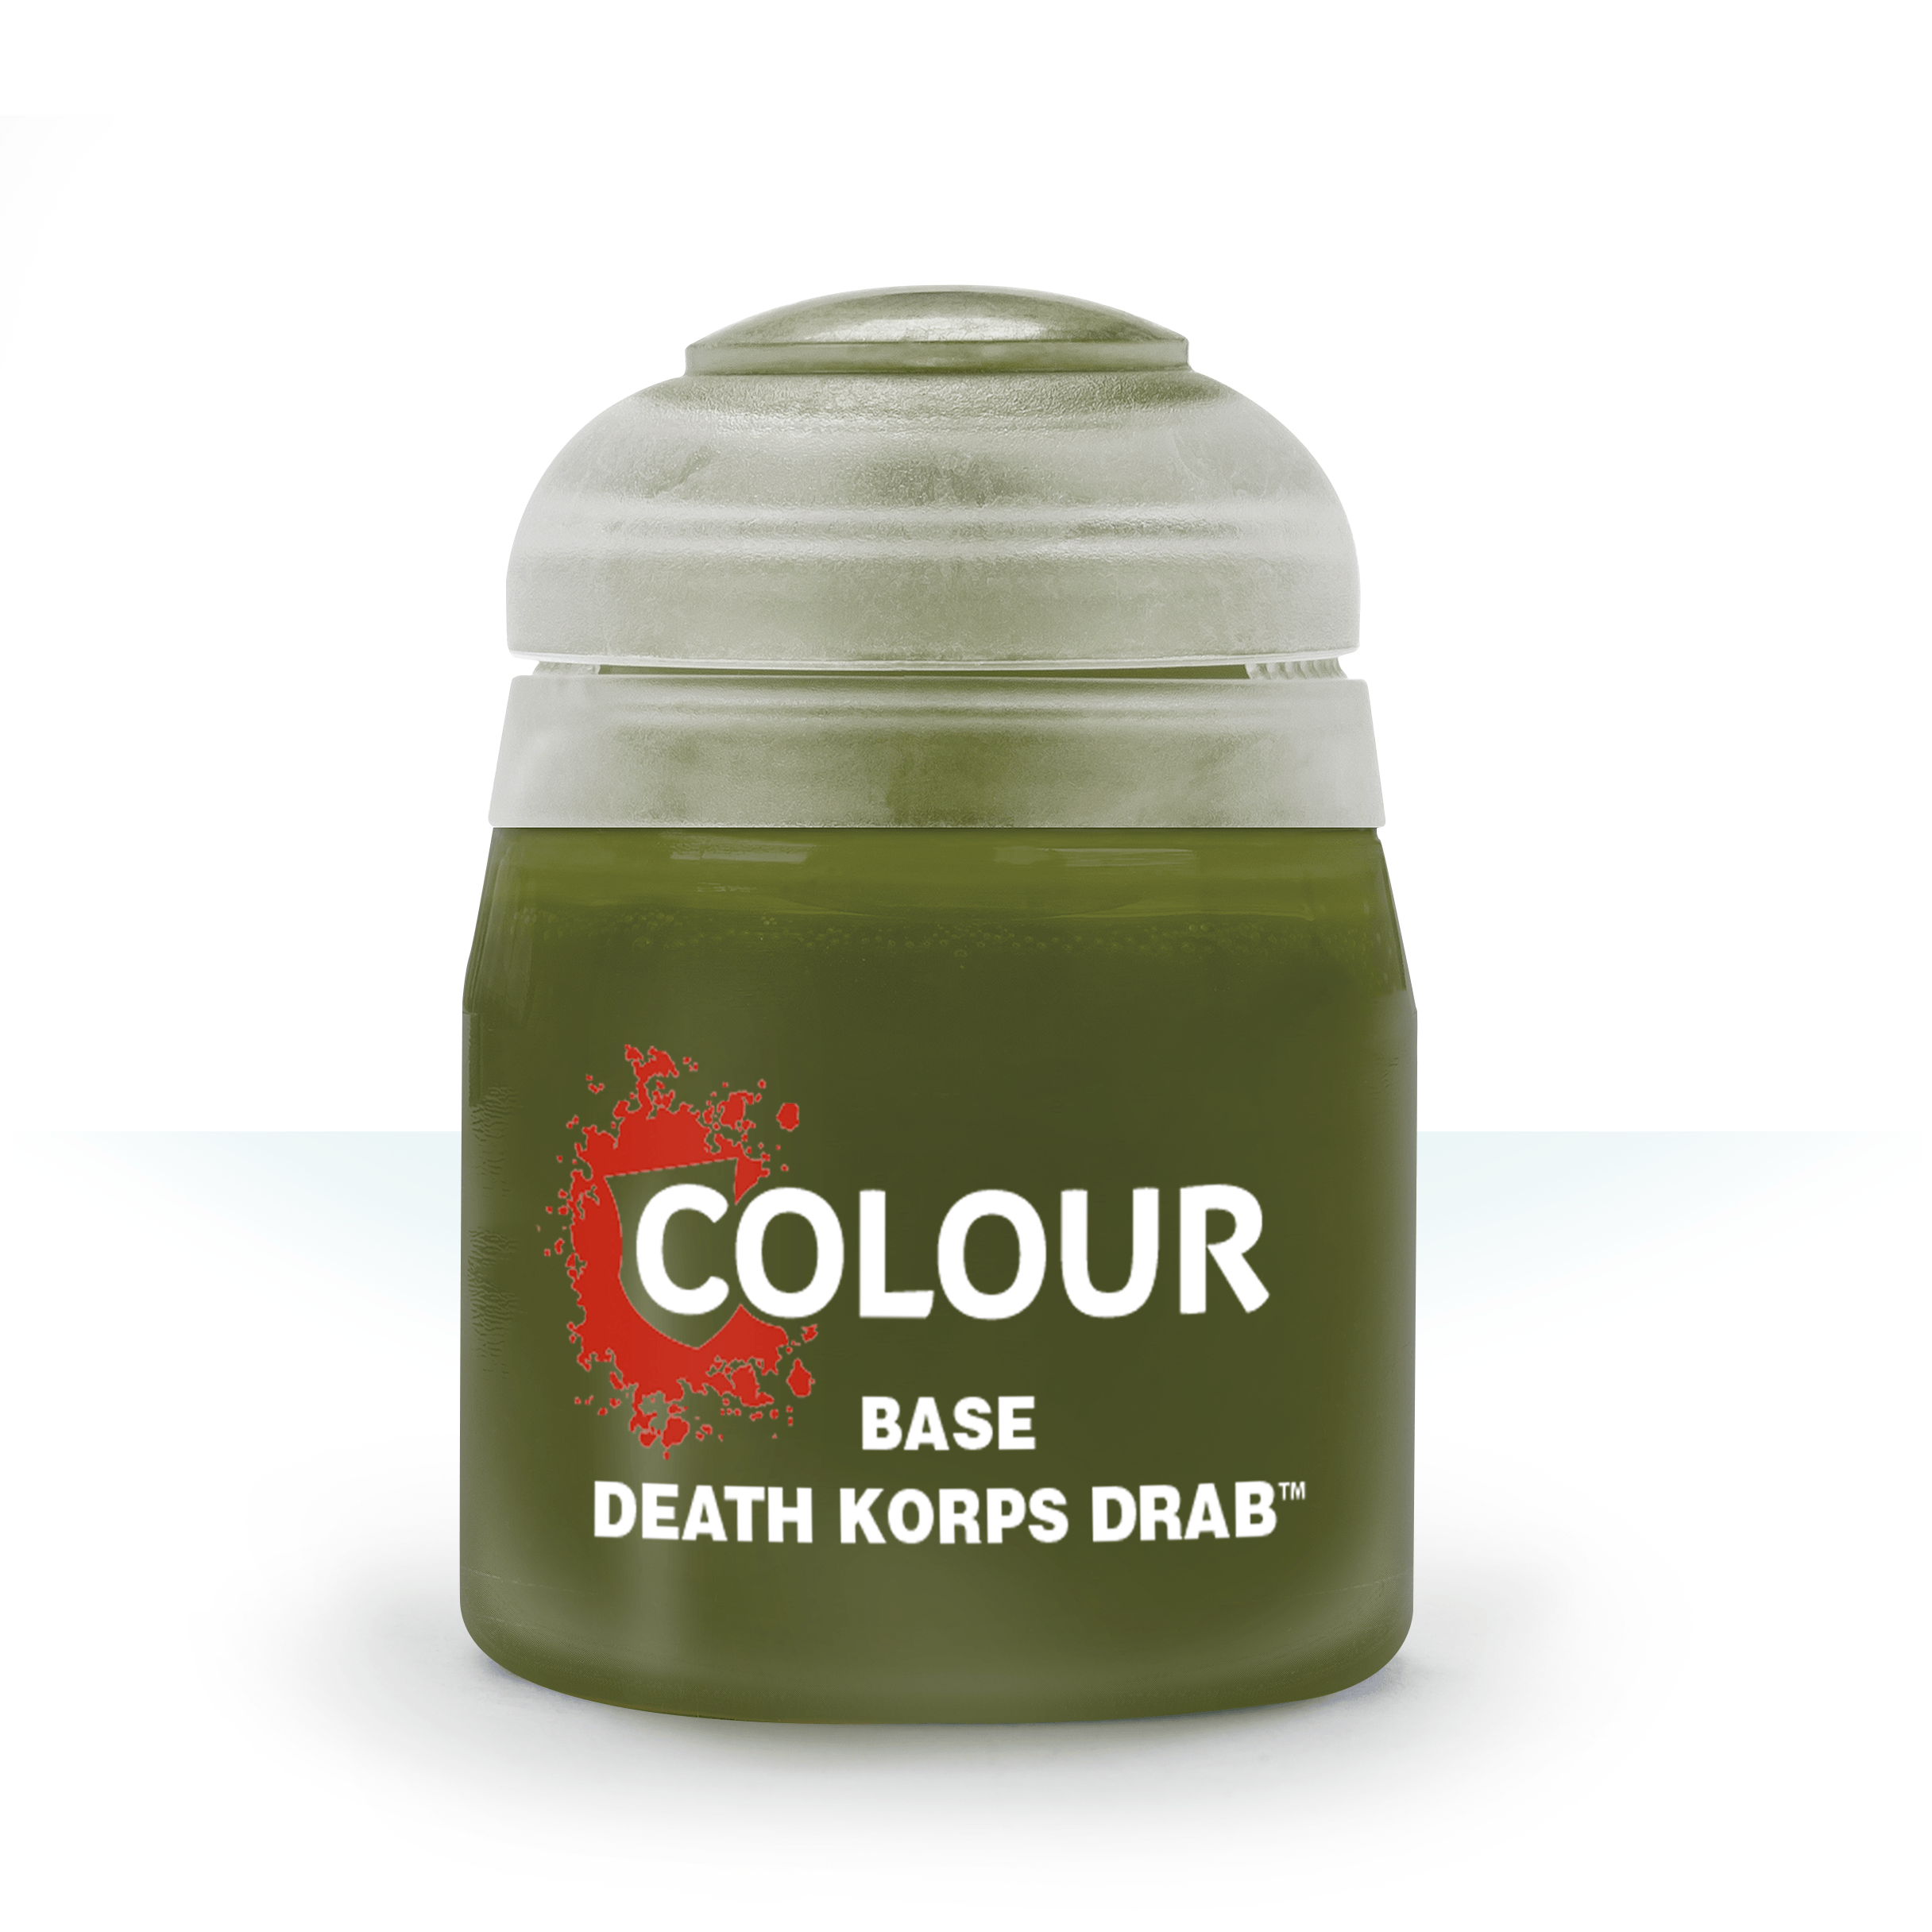 Death Korps Drab, Citadel Base 12ml